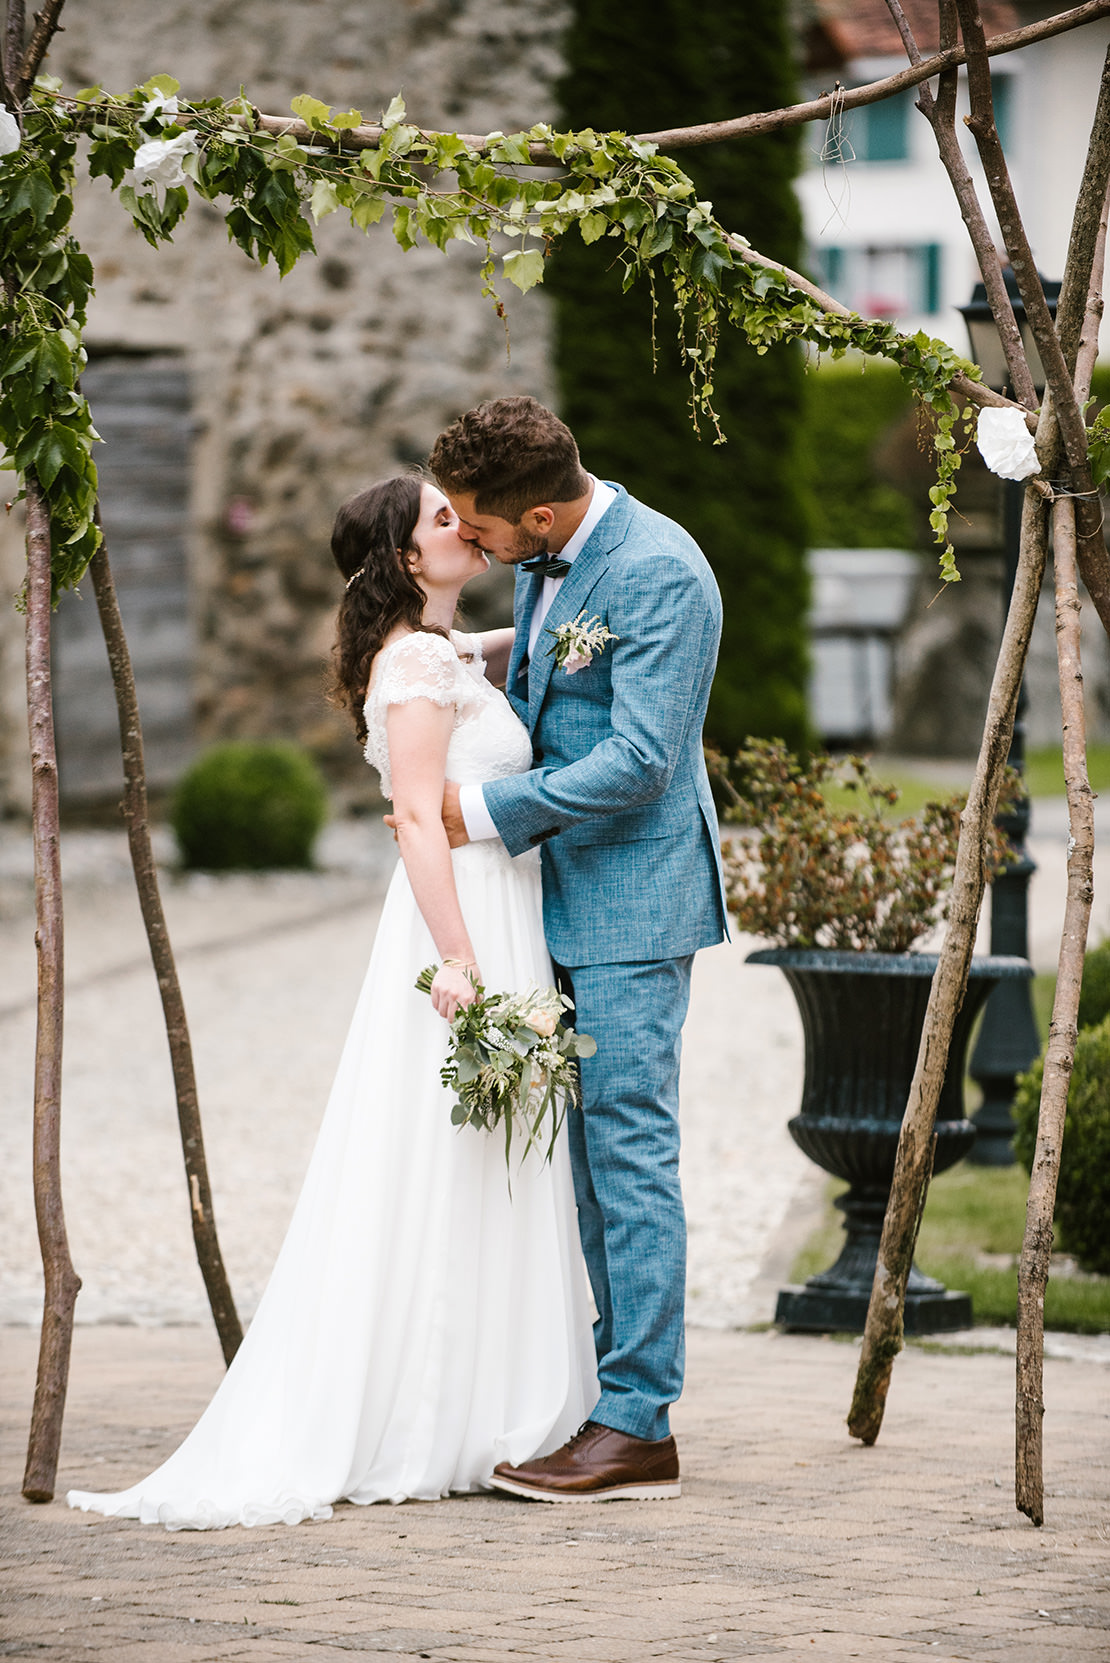 switzerland wedding photographer monika breitenmoser photography morges